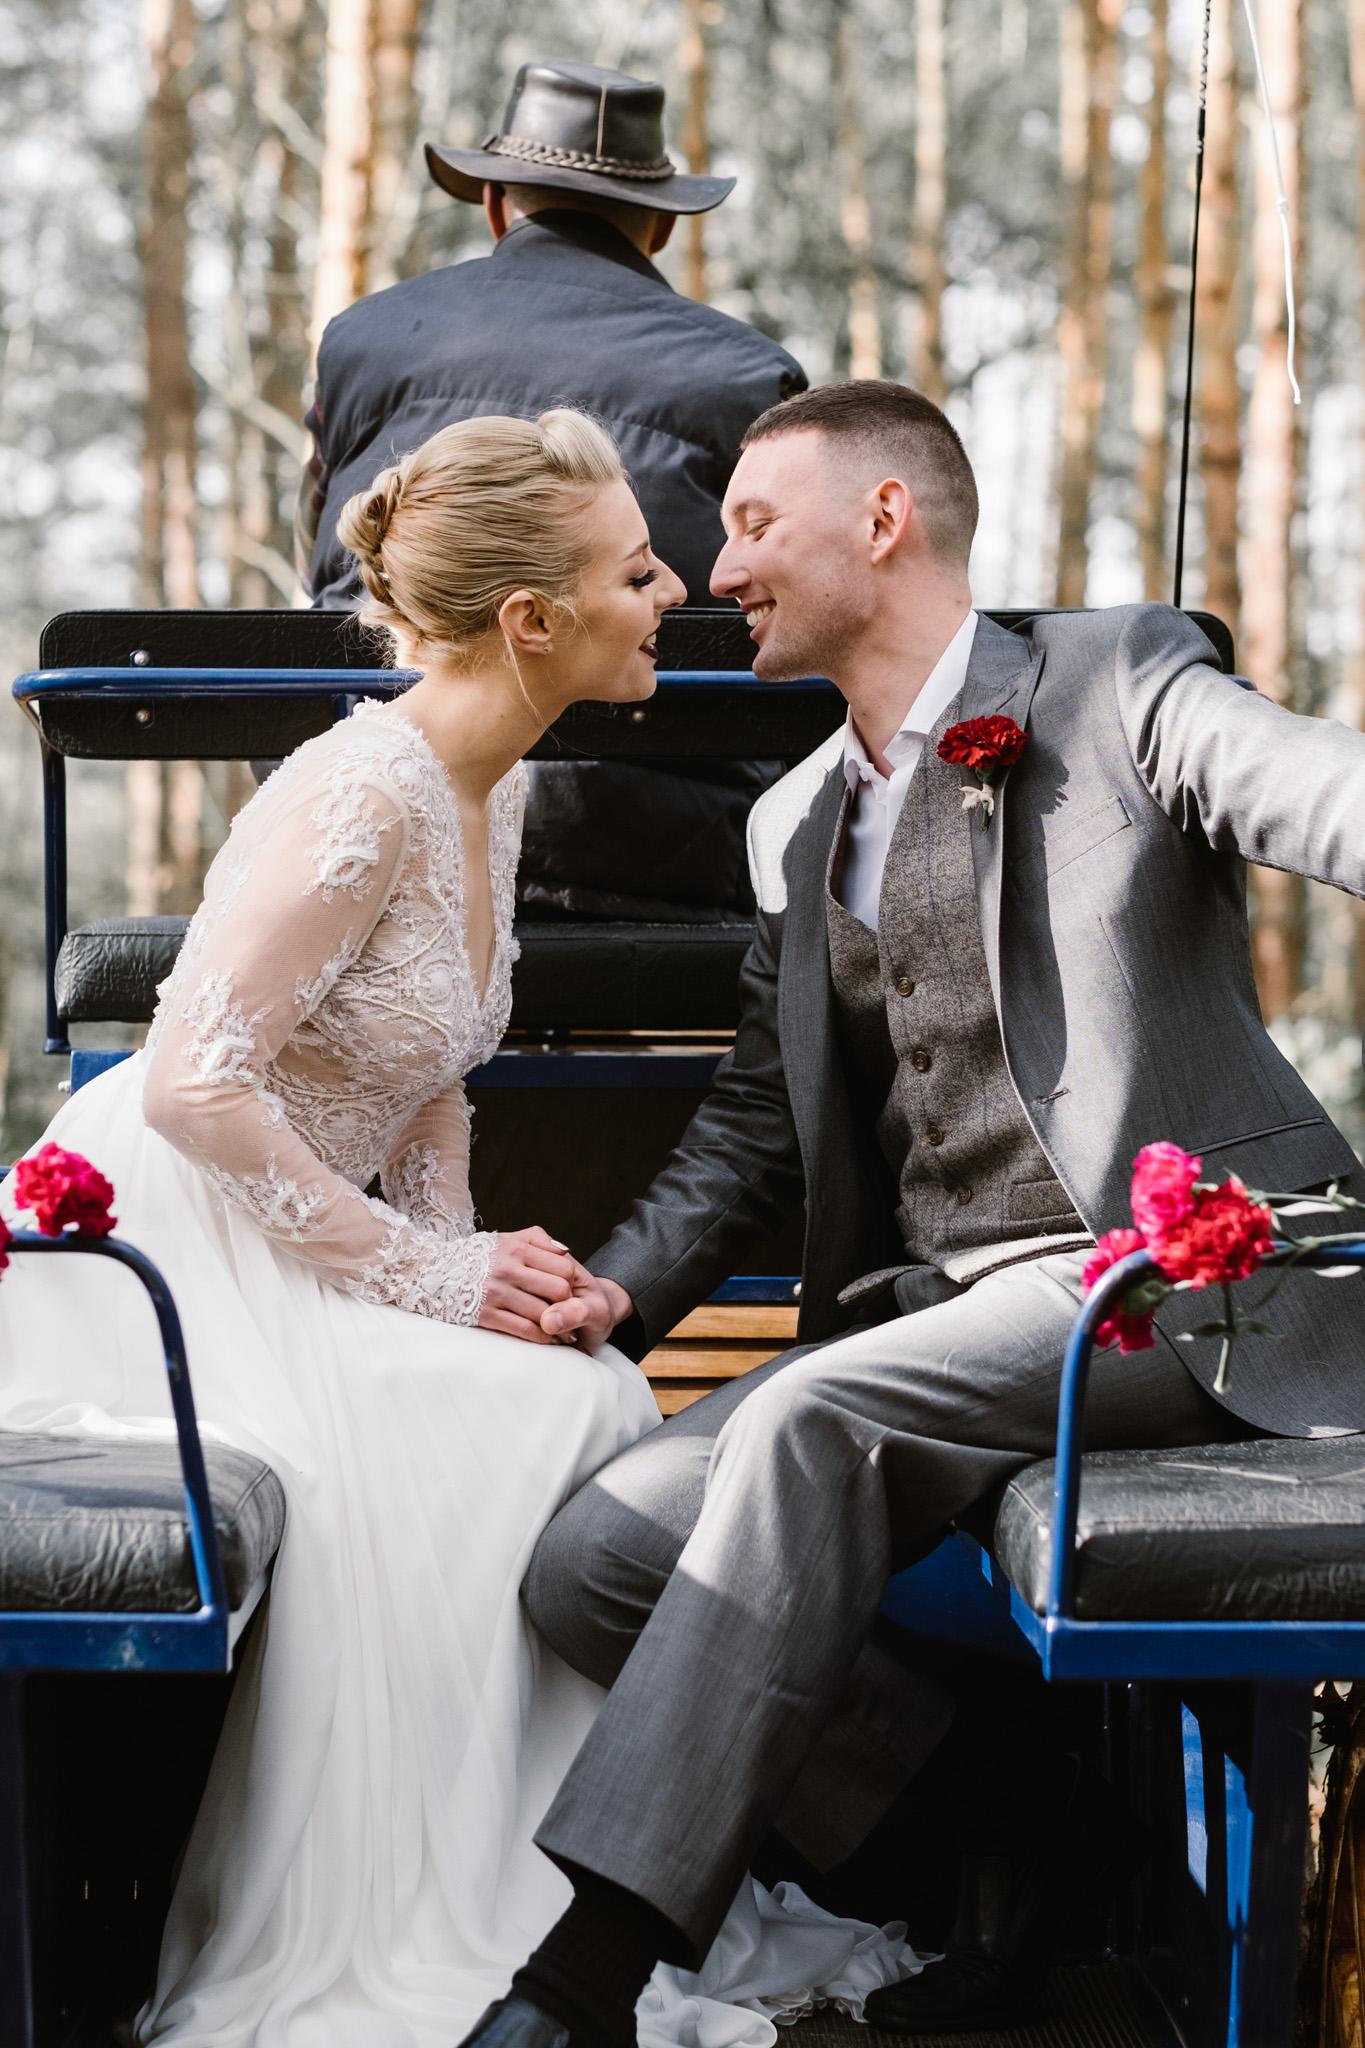 Captains-Wood-Barn-Alterative-Rustic-Vintage-Essex-Wedding-Suffolk-Grace-Elizabeth-17.jpg